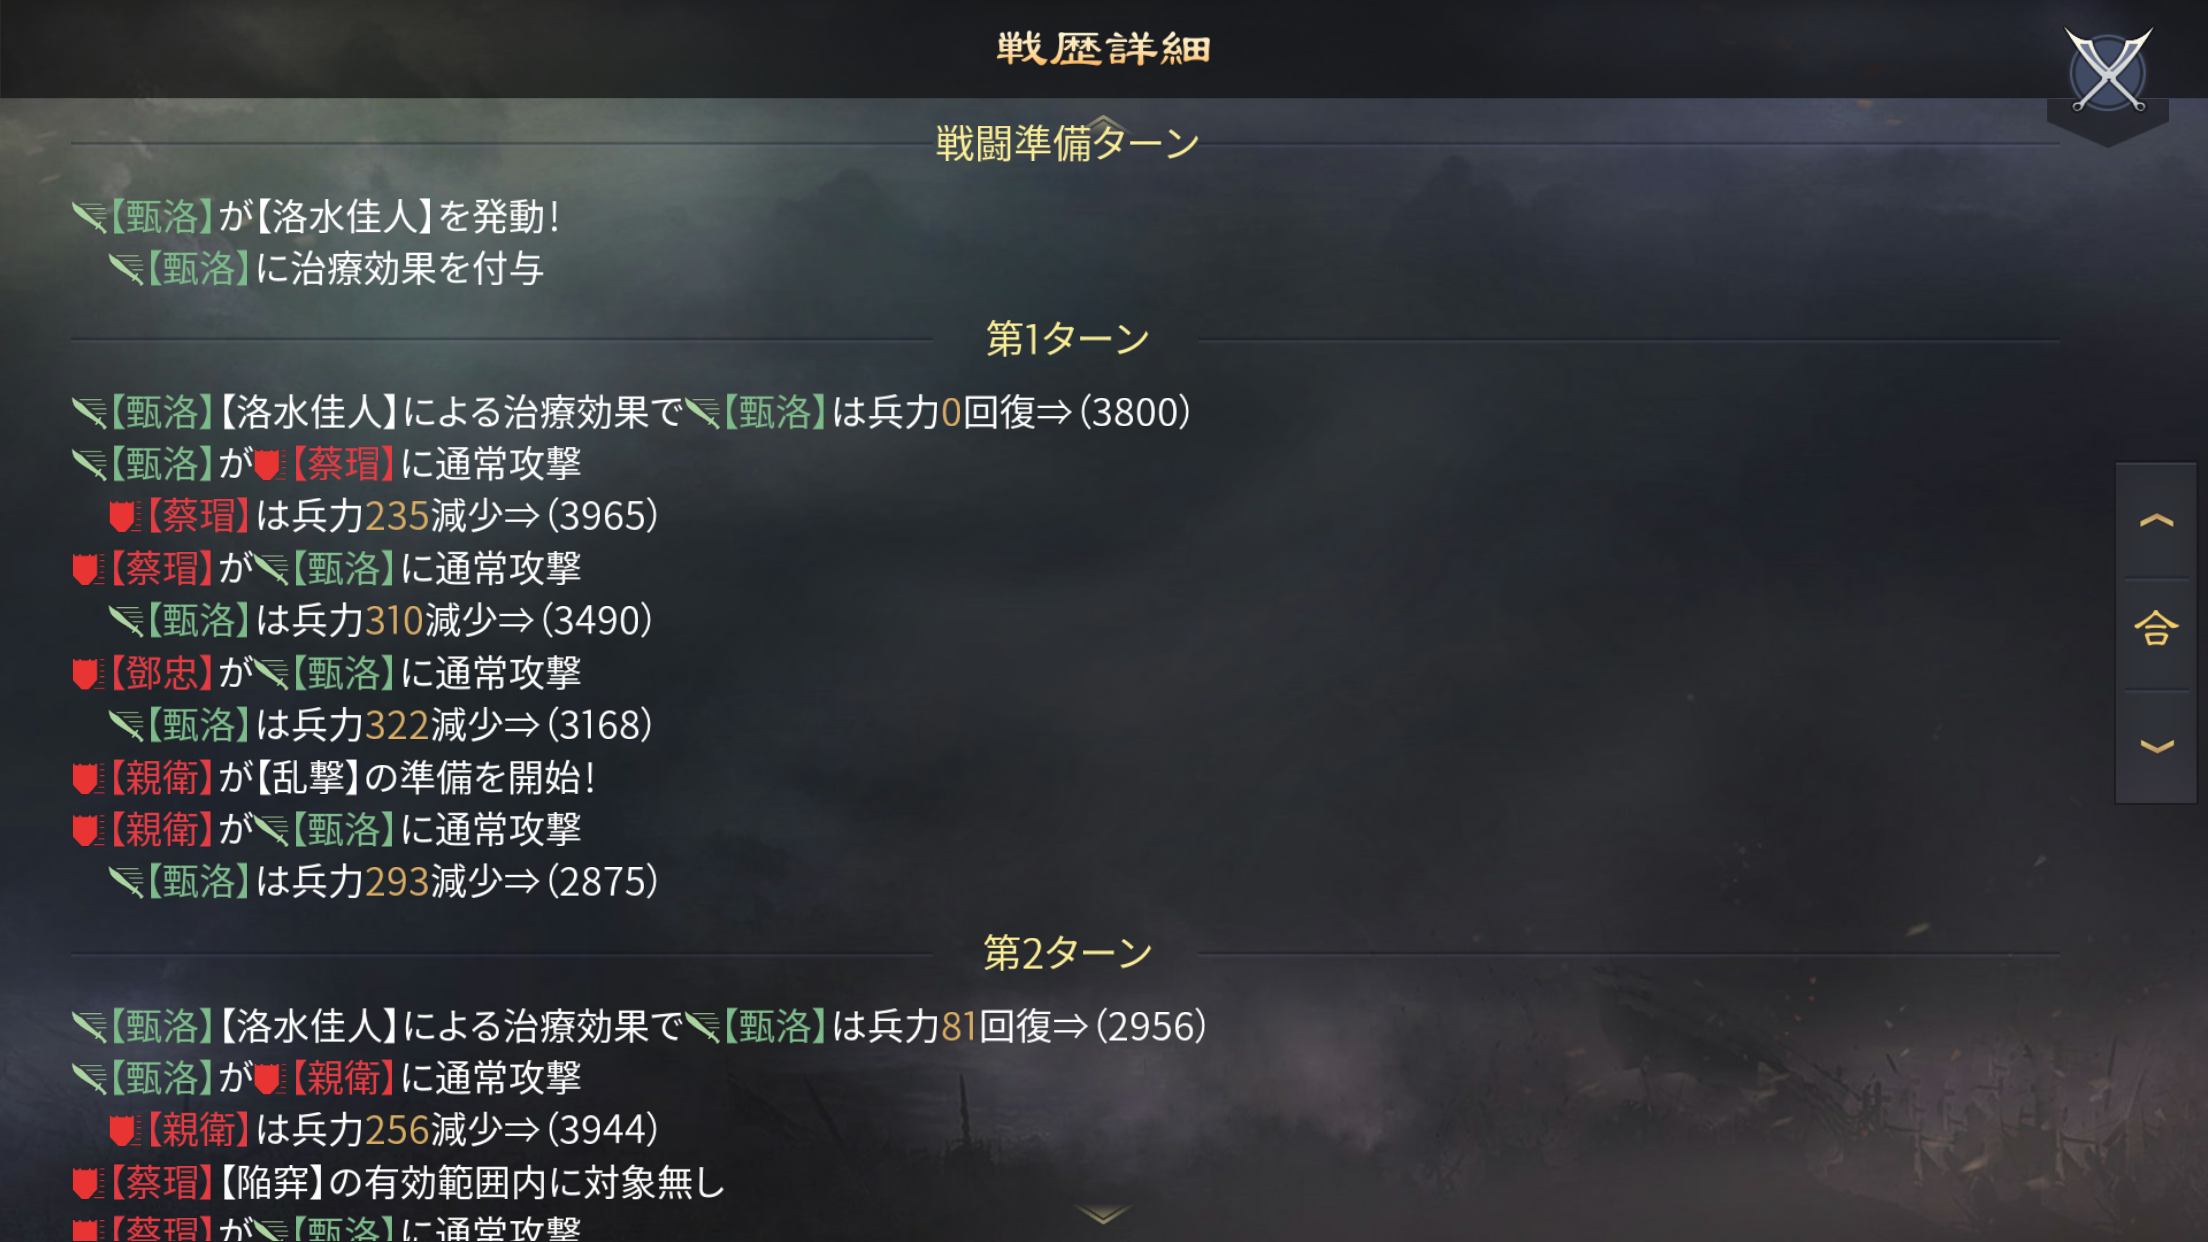 f:id:daisangokushimomimomi:20200327181053p:image